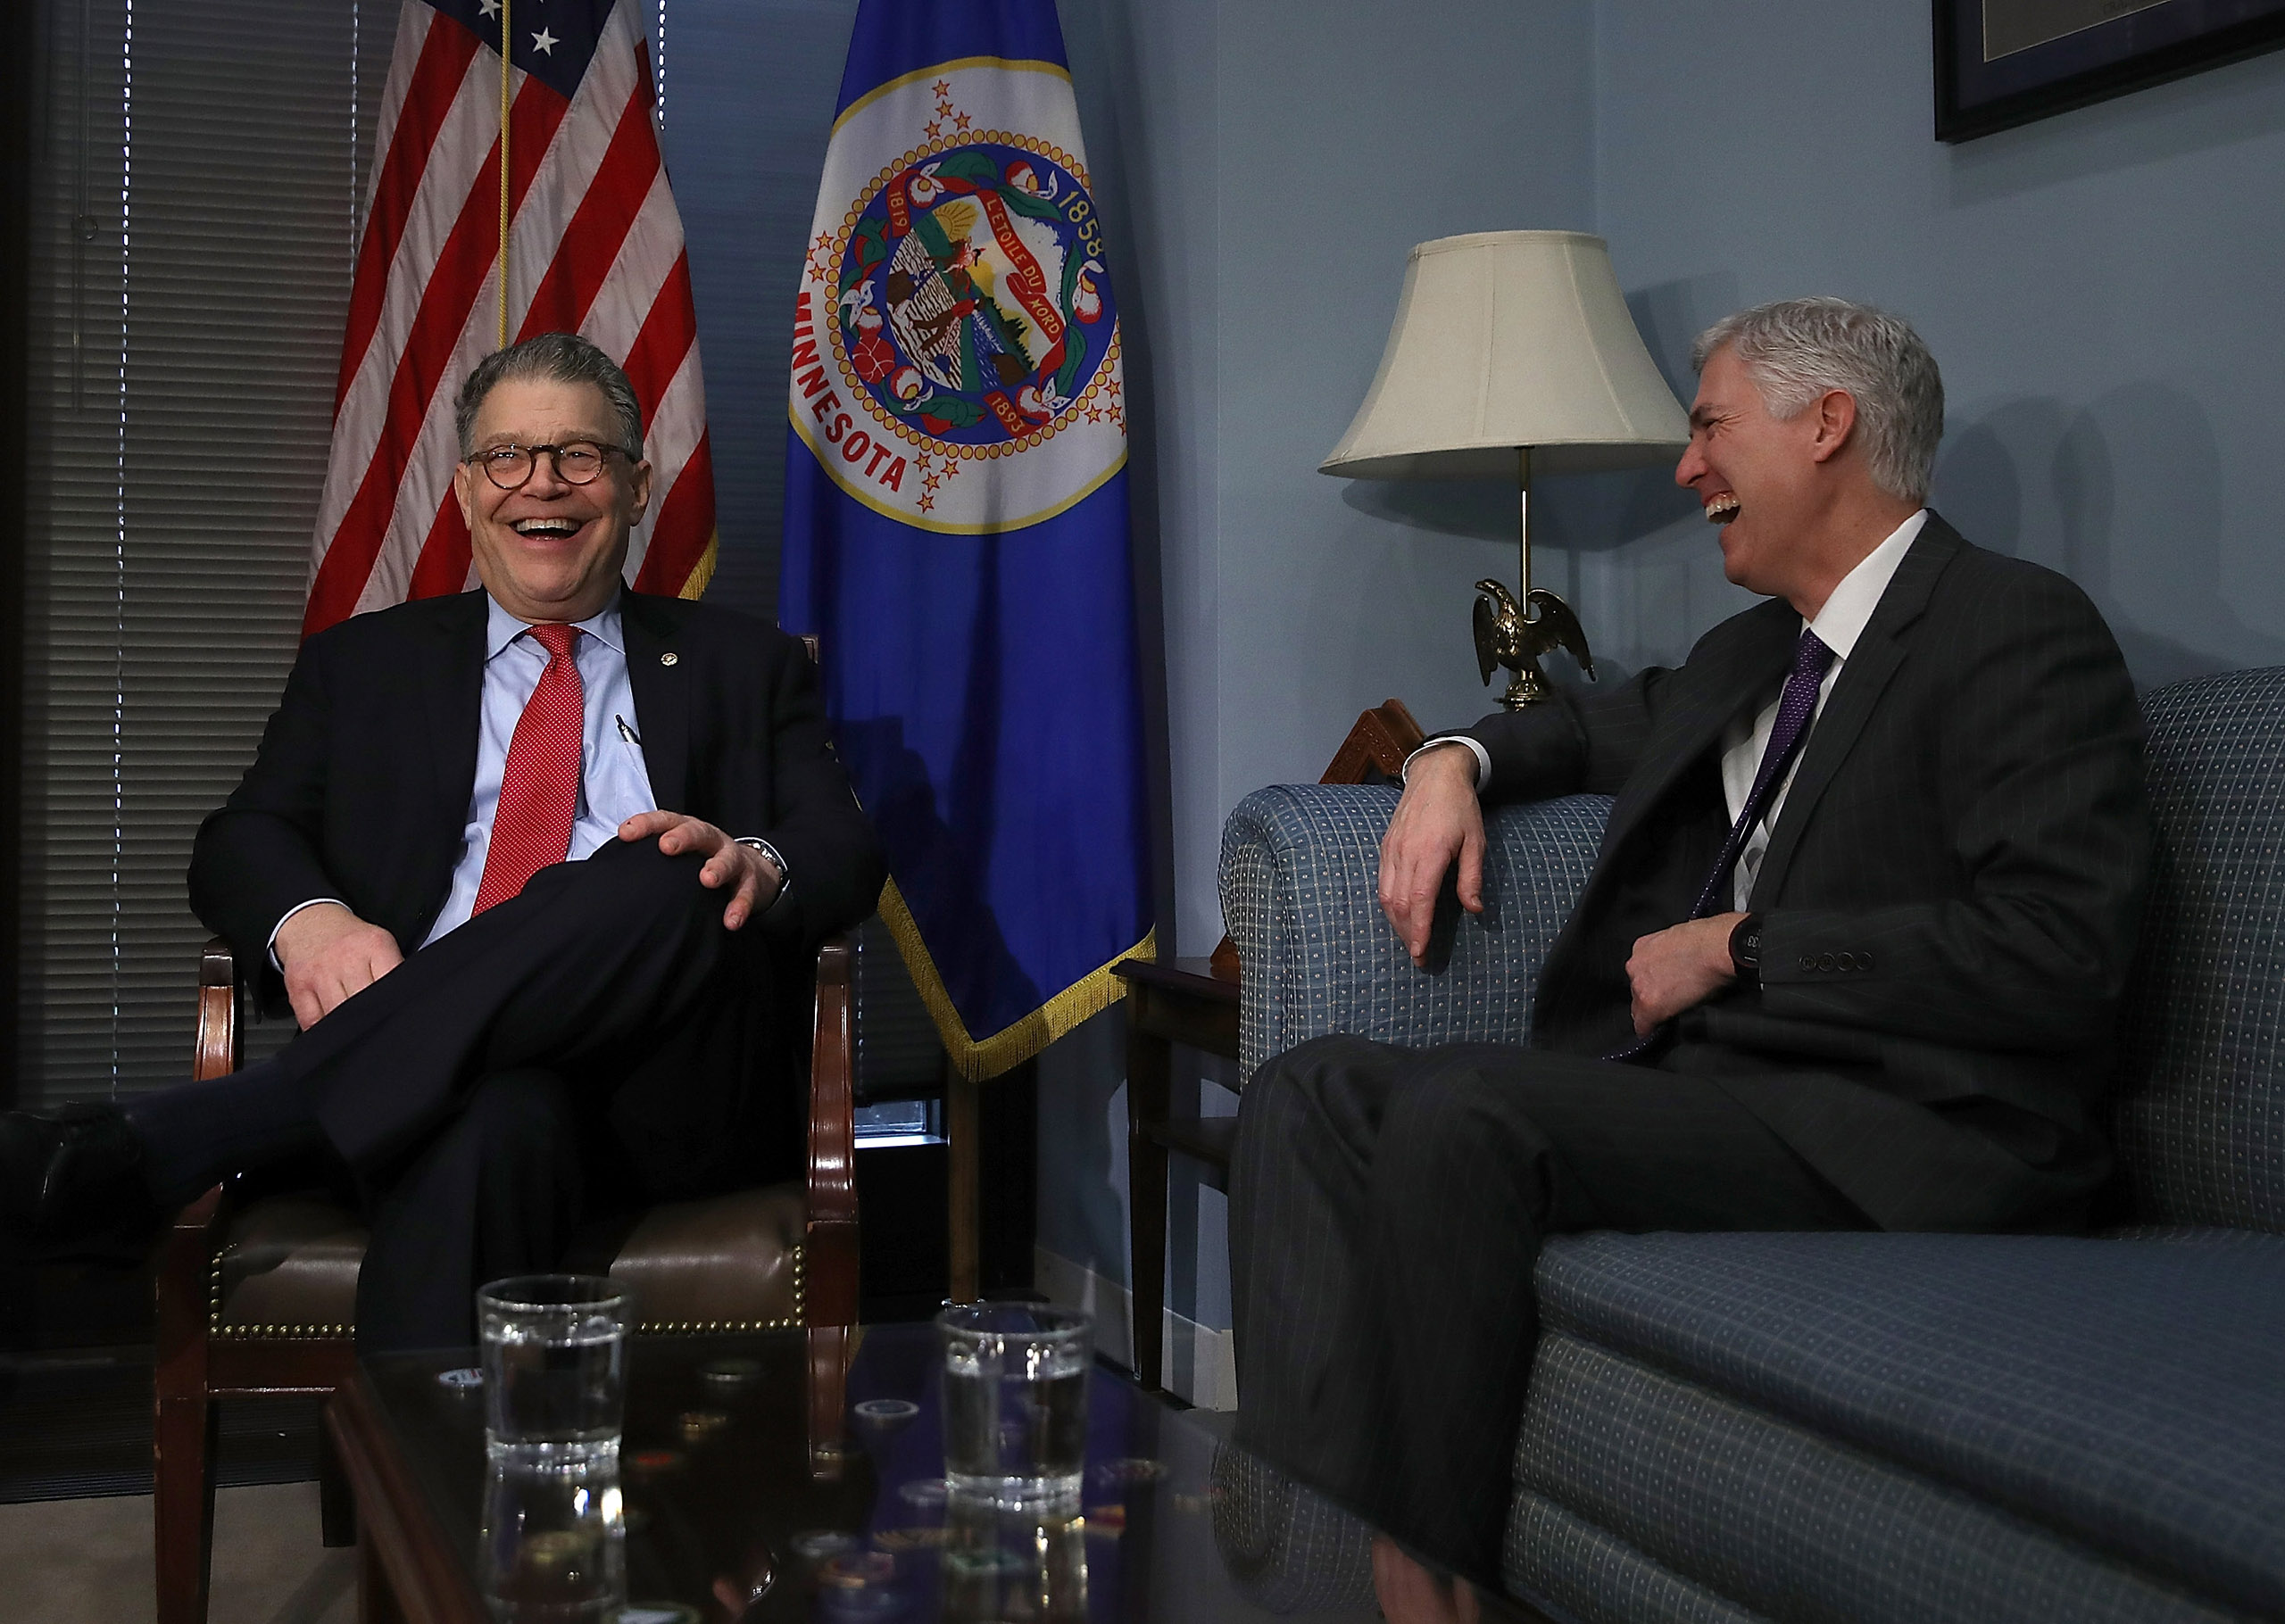 U.S. Supreme Court nominee Judge Neil Gorsuch (R) meets with U.S. Sen. Al Franken (D-MN) in Franken's office on Capitol Hill March 7, 2017 in Washington, D.C.